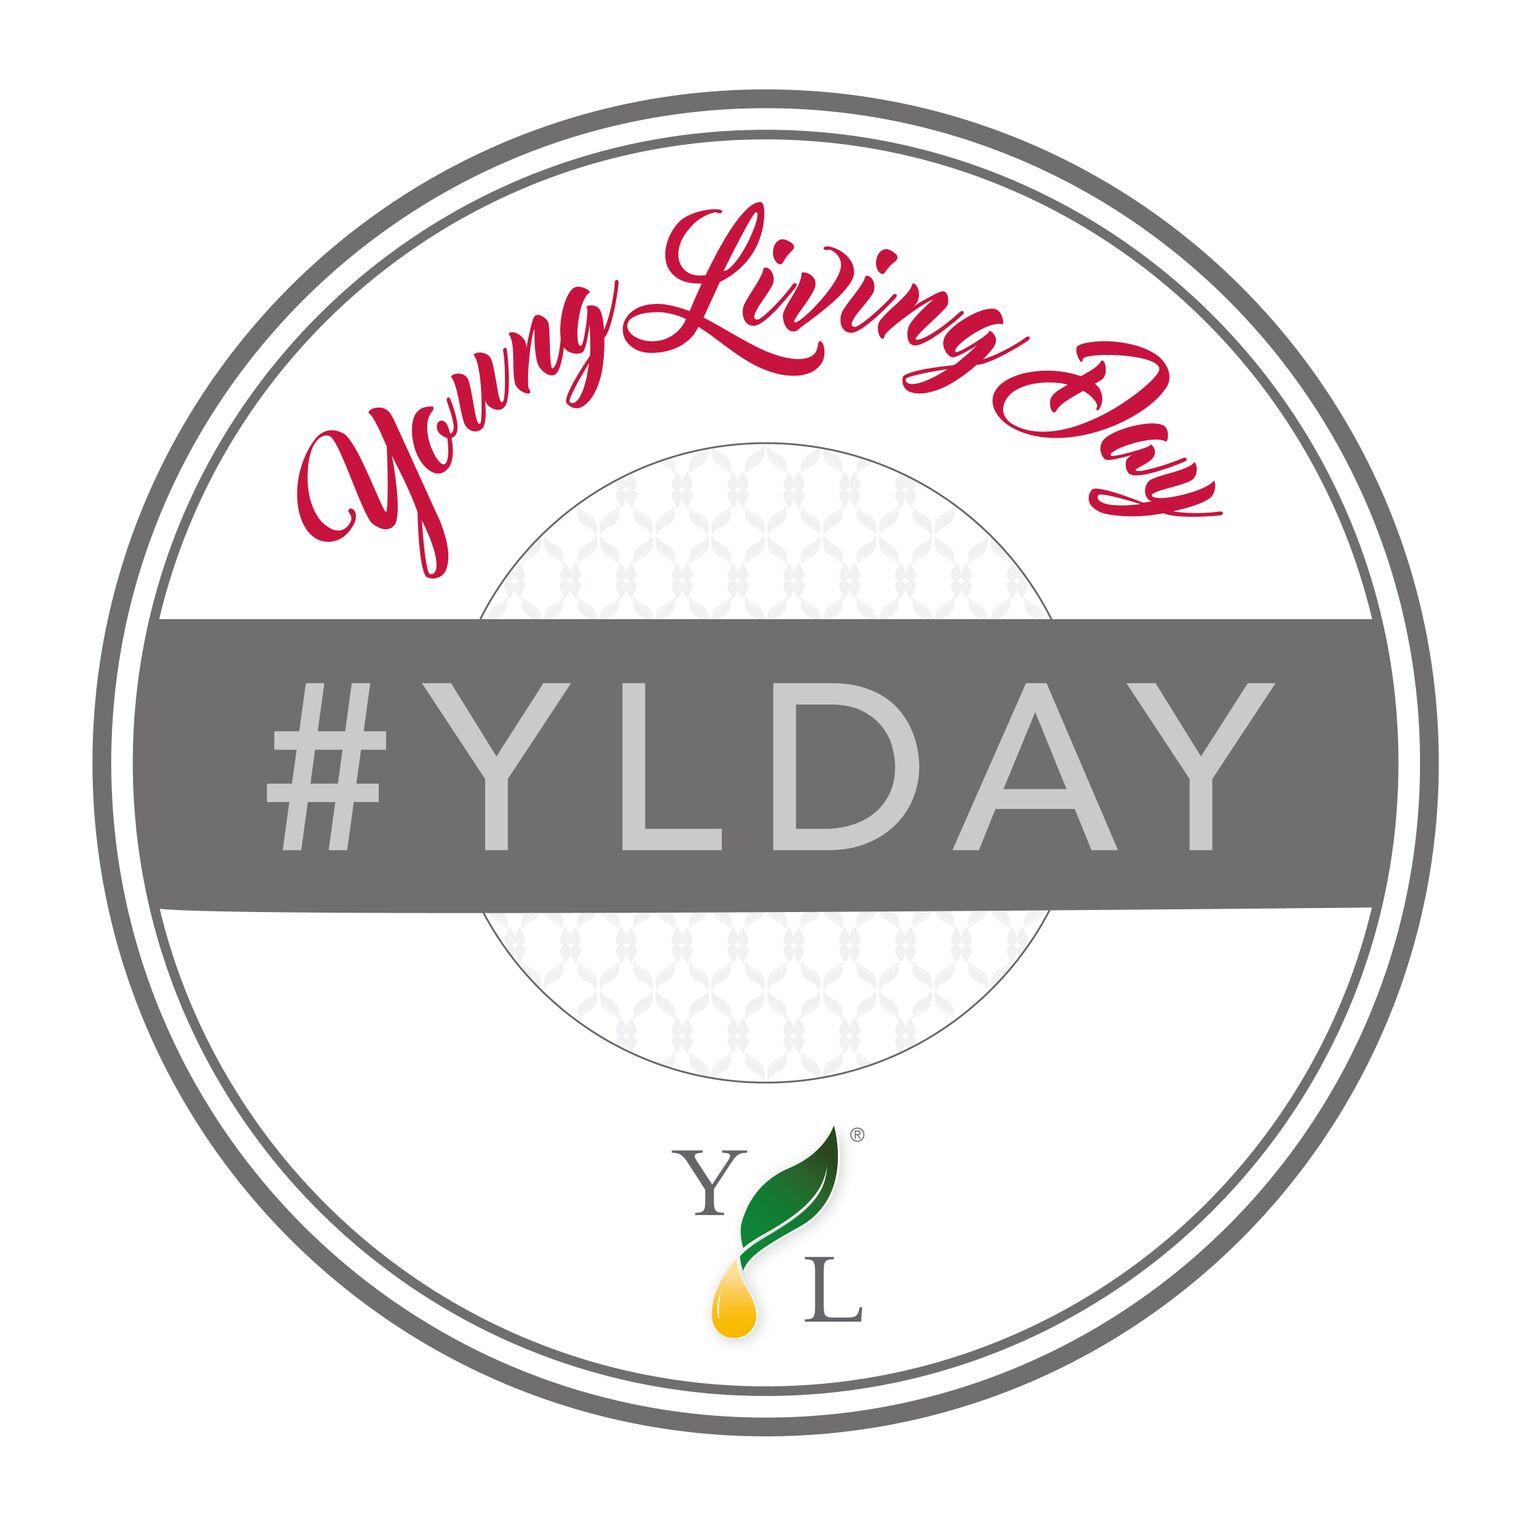 https___static.youngliving.com_EU-DOCS_IMGS_yl_unites_YoungLivingDay_Logo_EUR(1).jpg